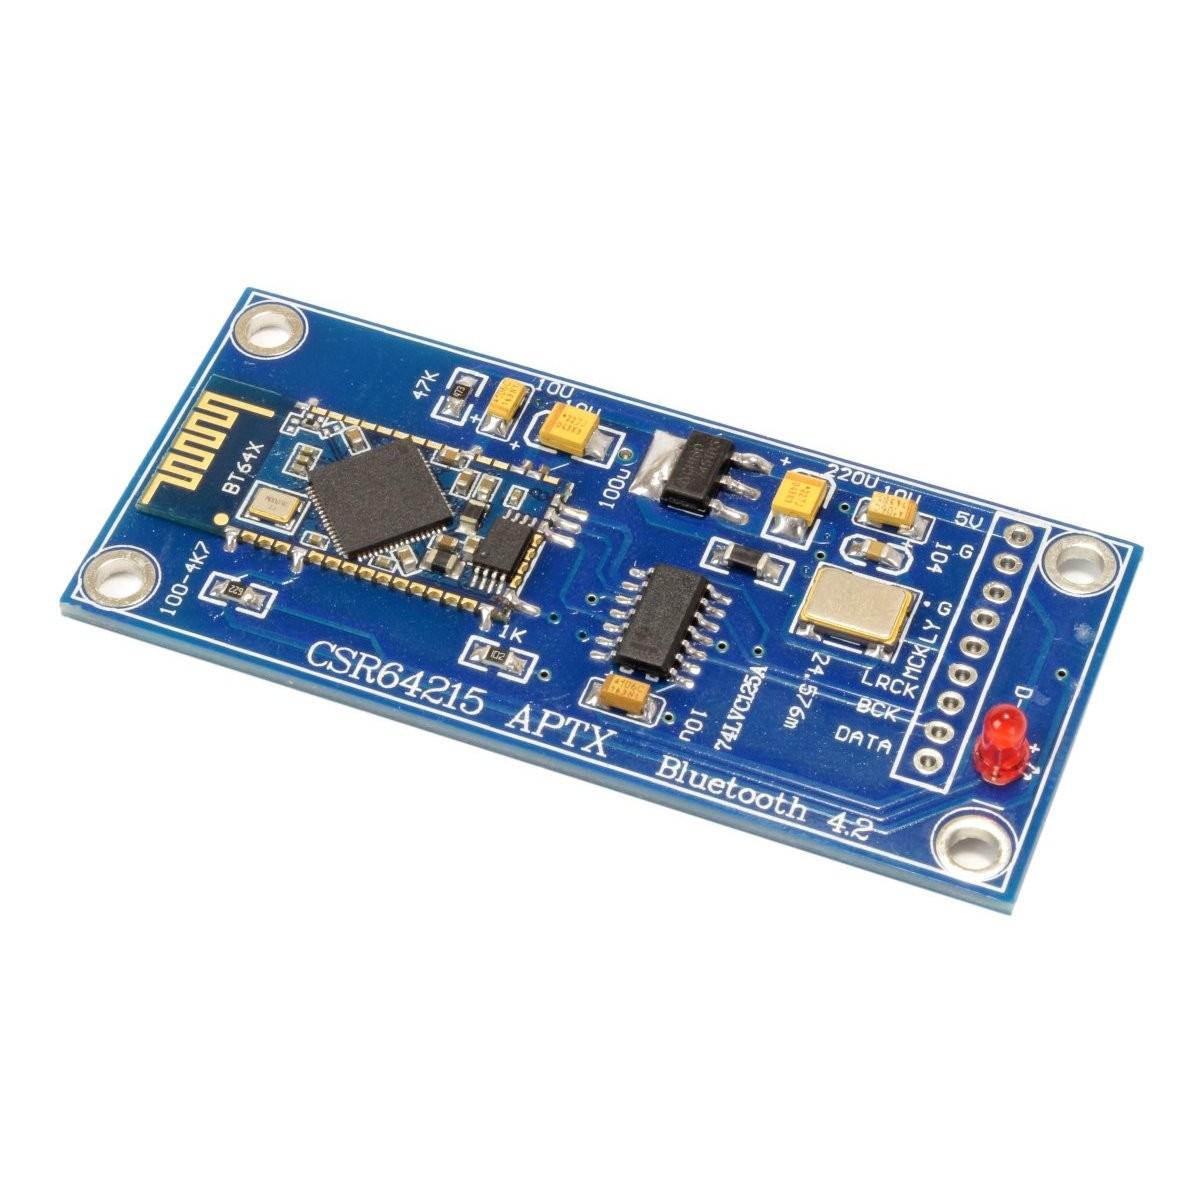 Bluetooth Receiver CSR64215 4.2 aptX to I2S